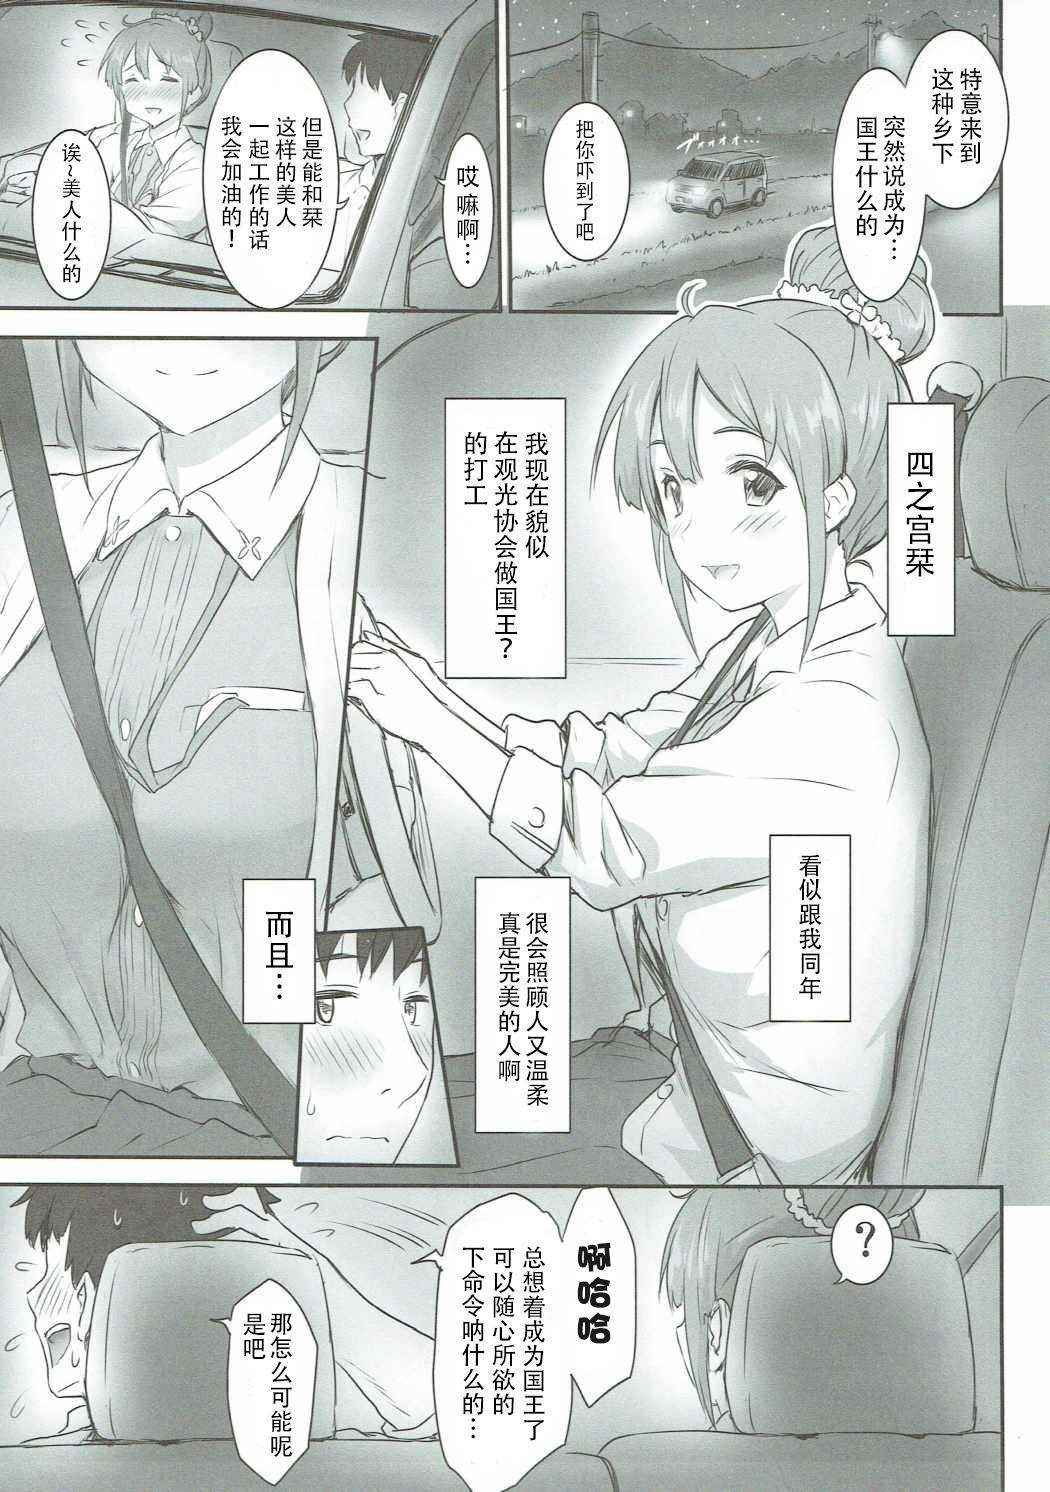 Shiori Quest 4